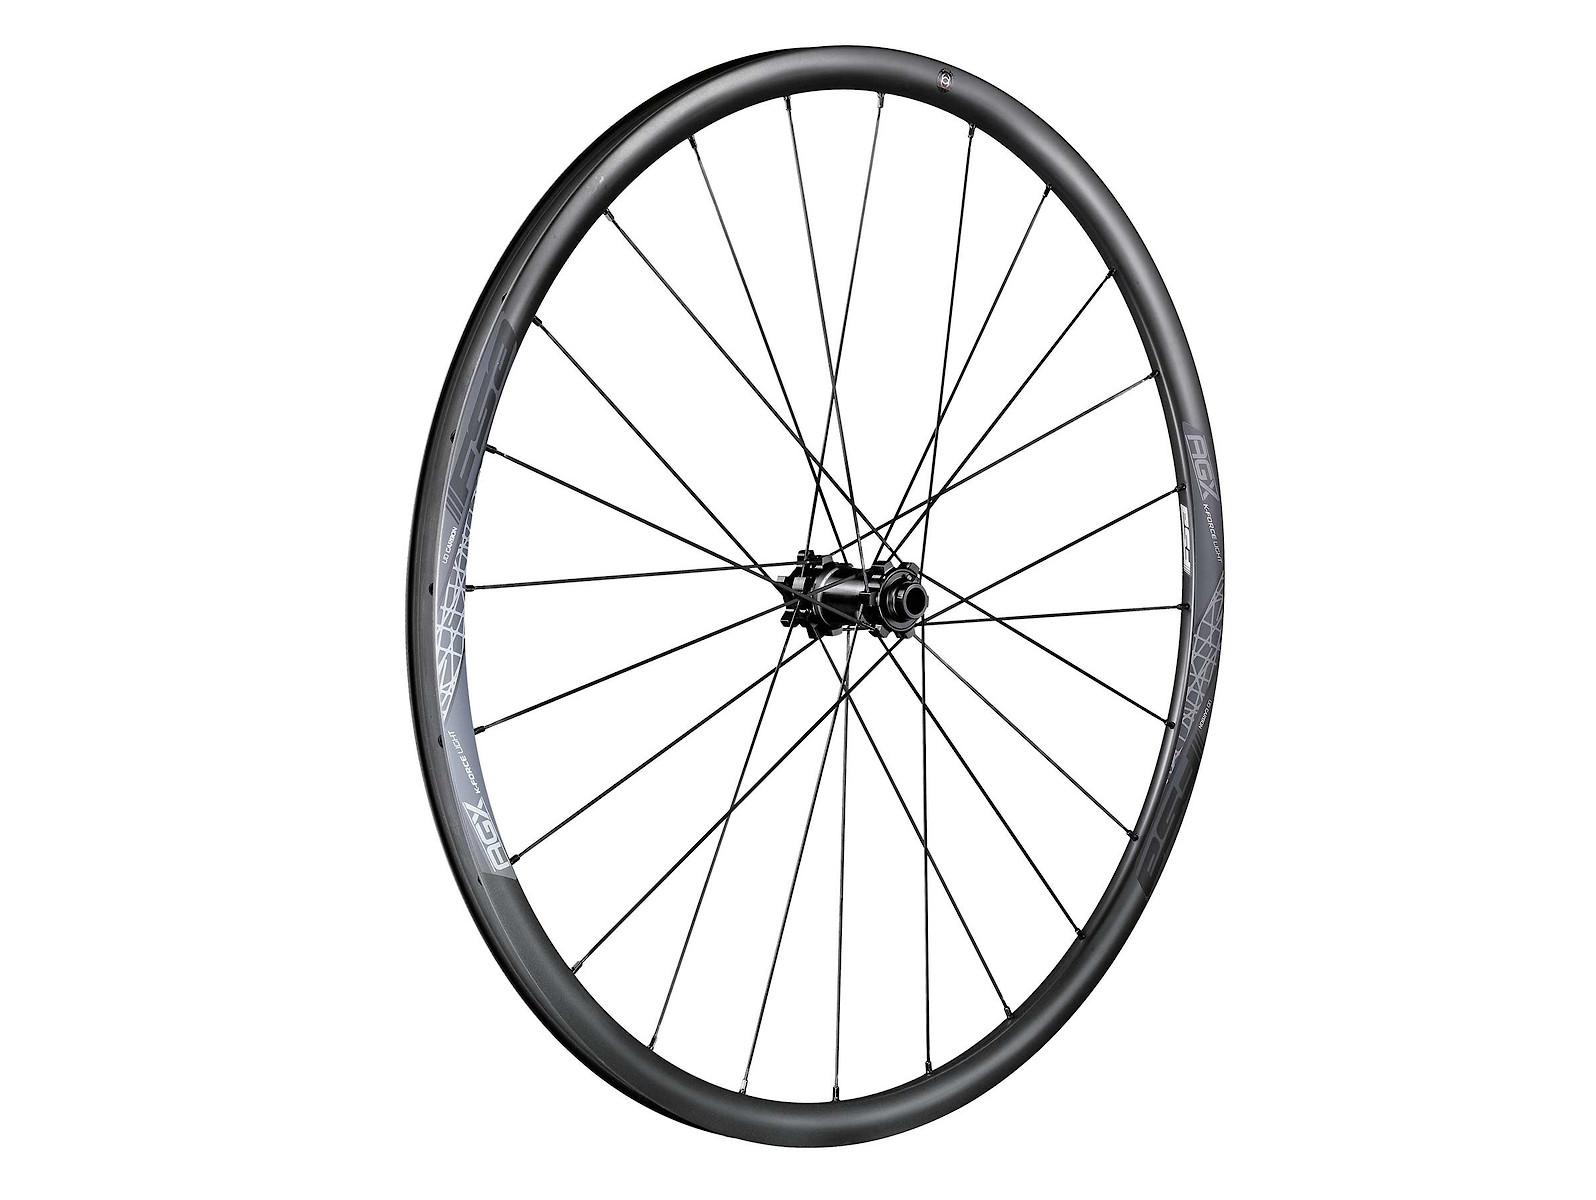 FSA K-Force AGX Carbon Front Wheel